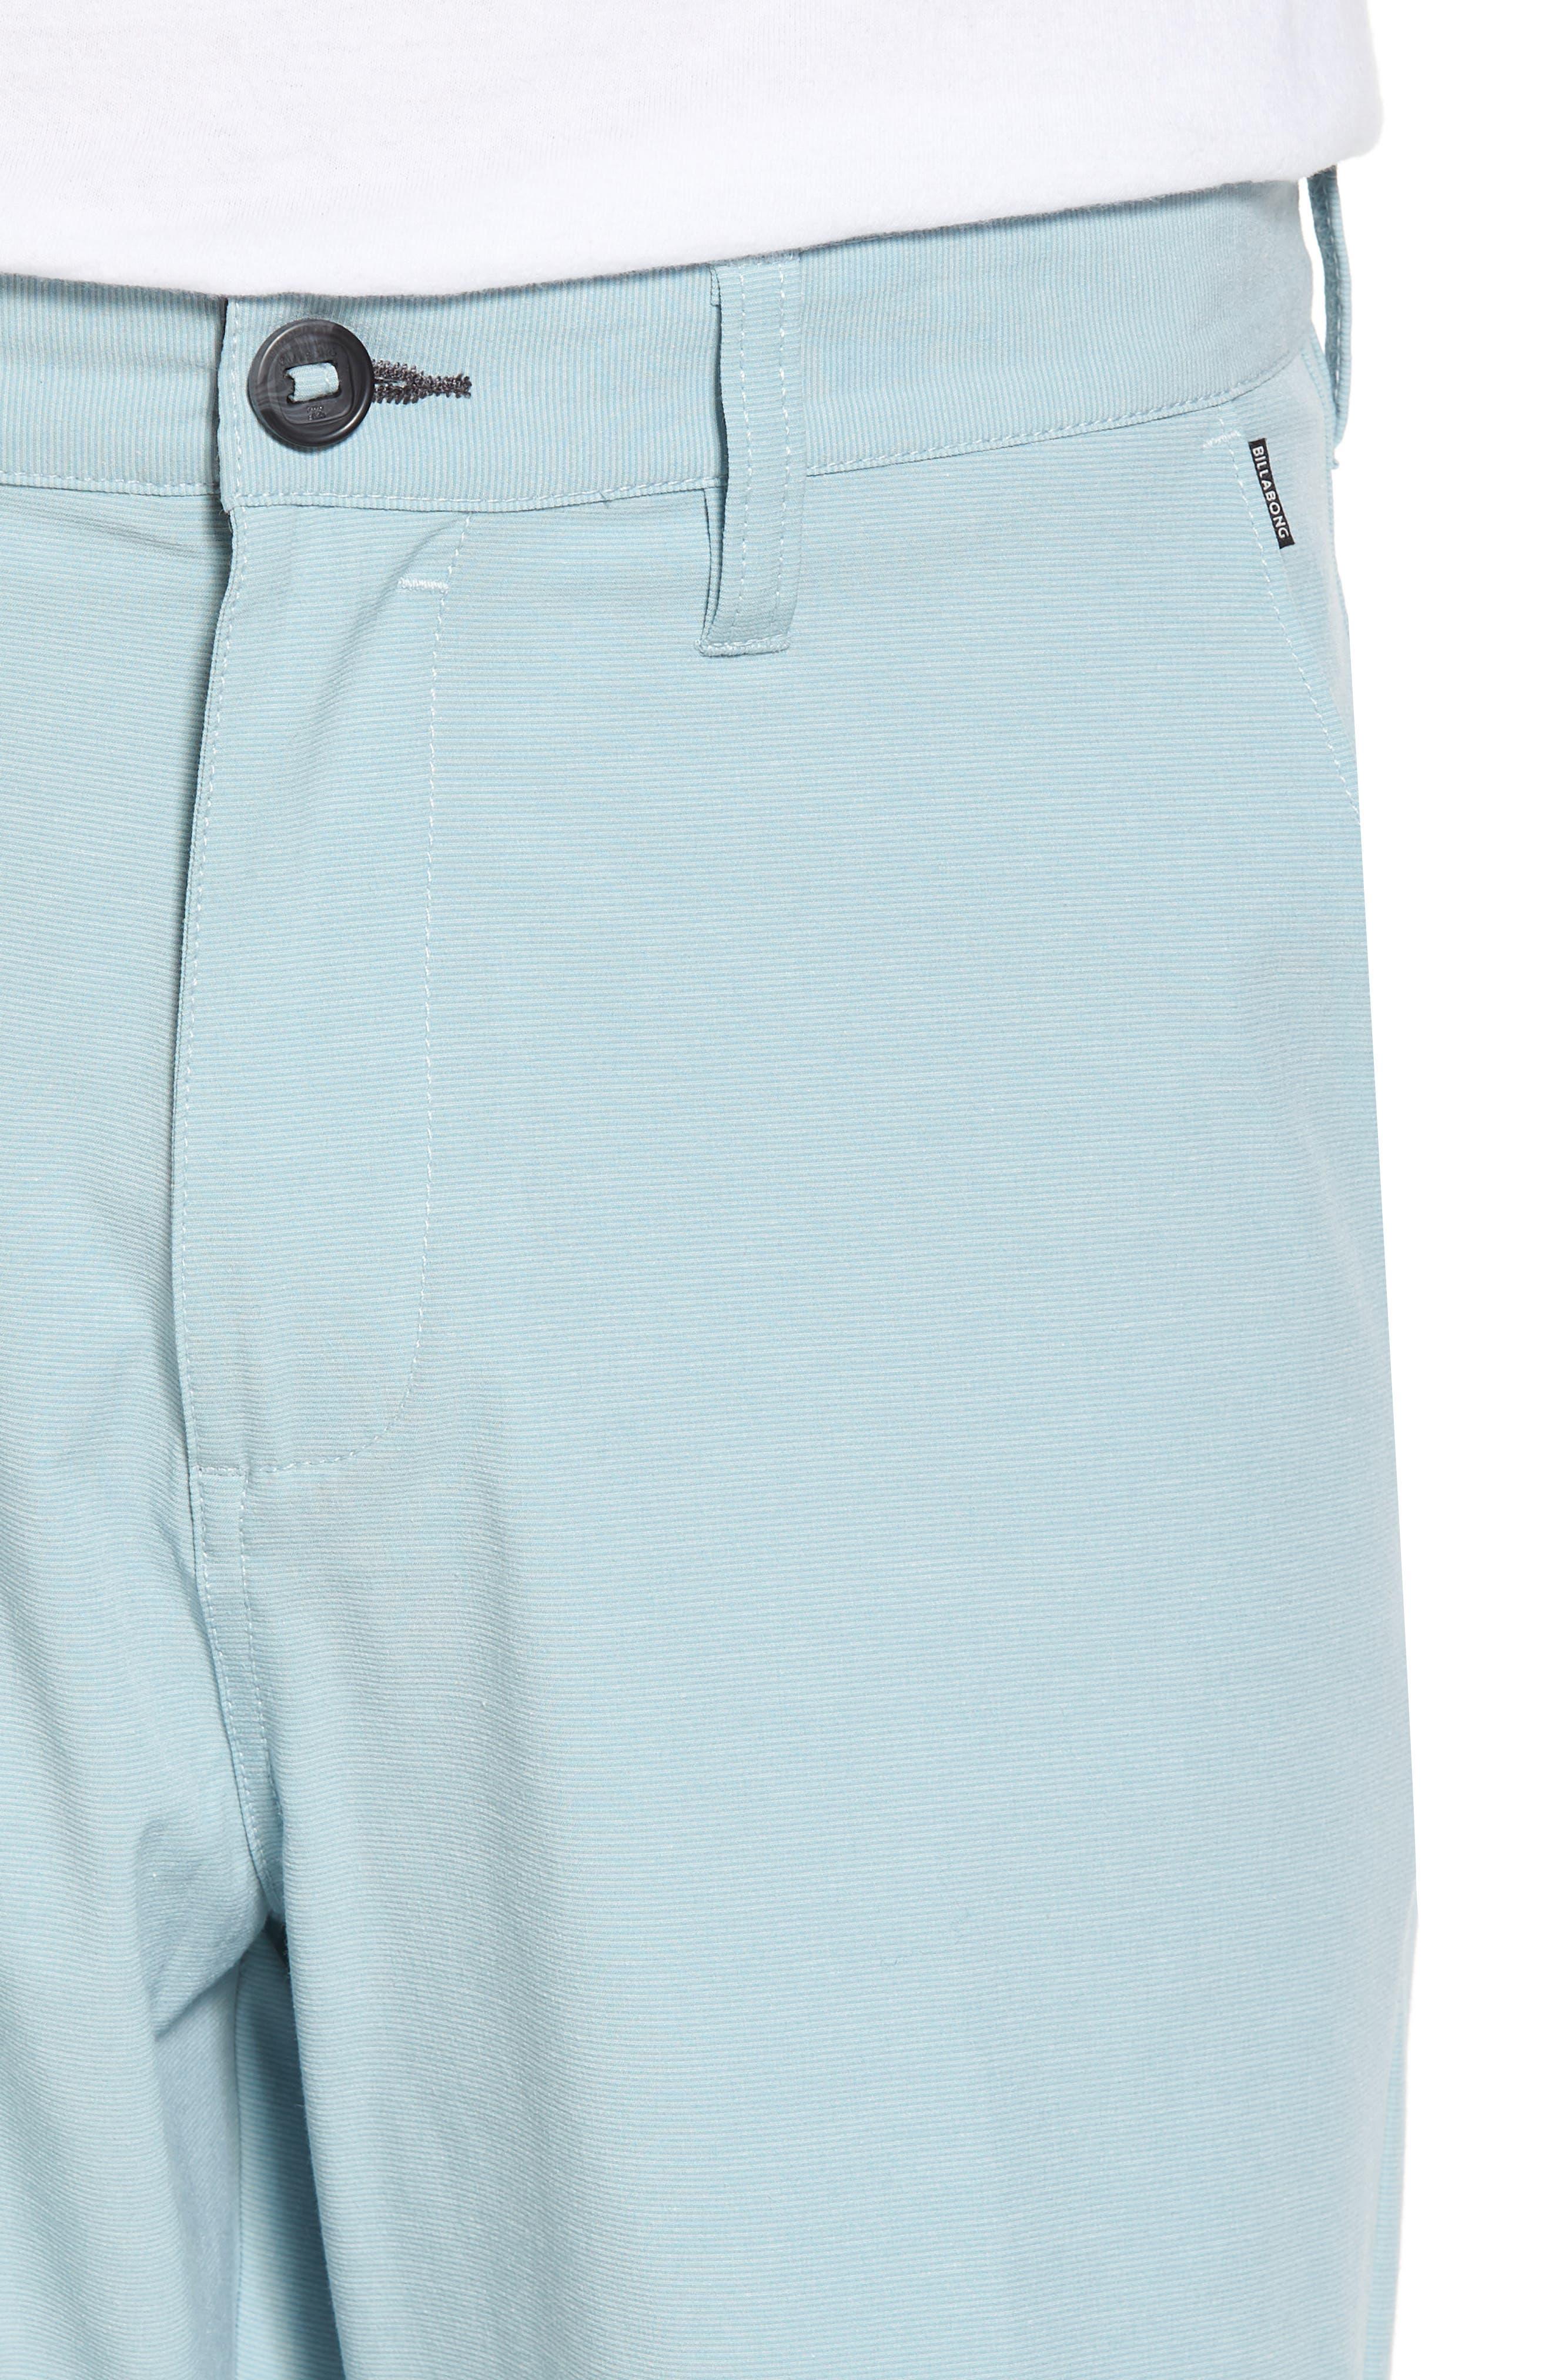 Crossfire X Hybrid Shorts,                             Alternate thumbnail 22, color,